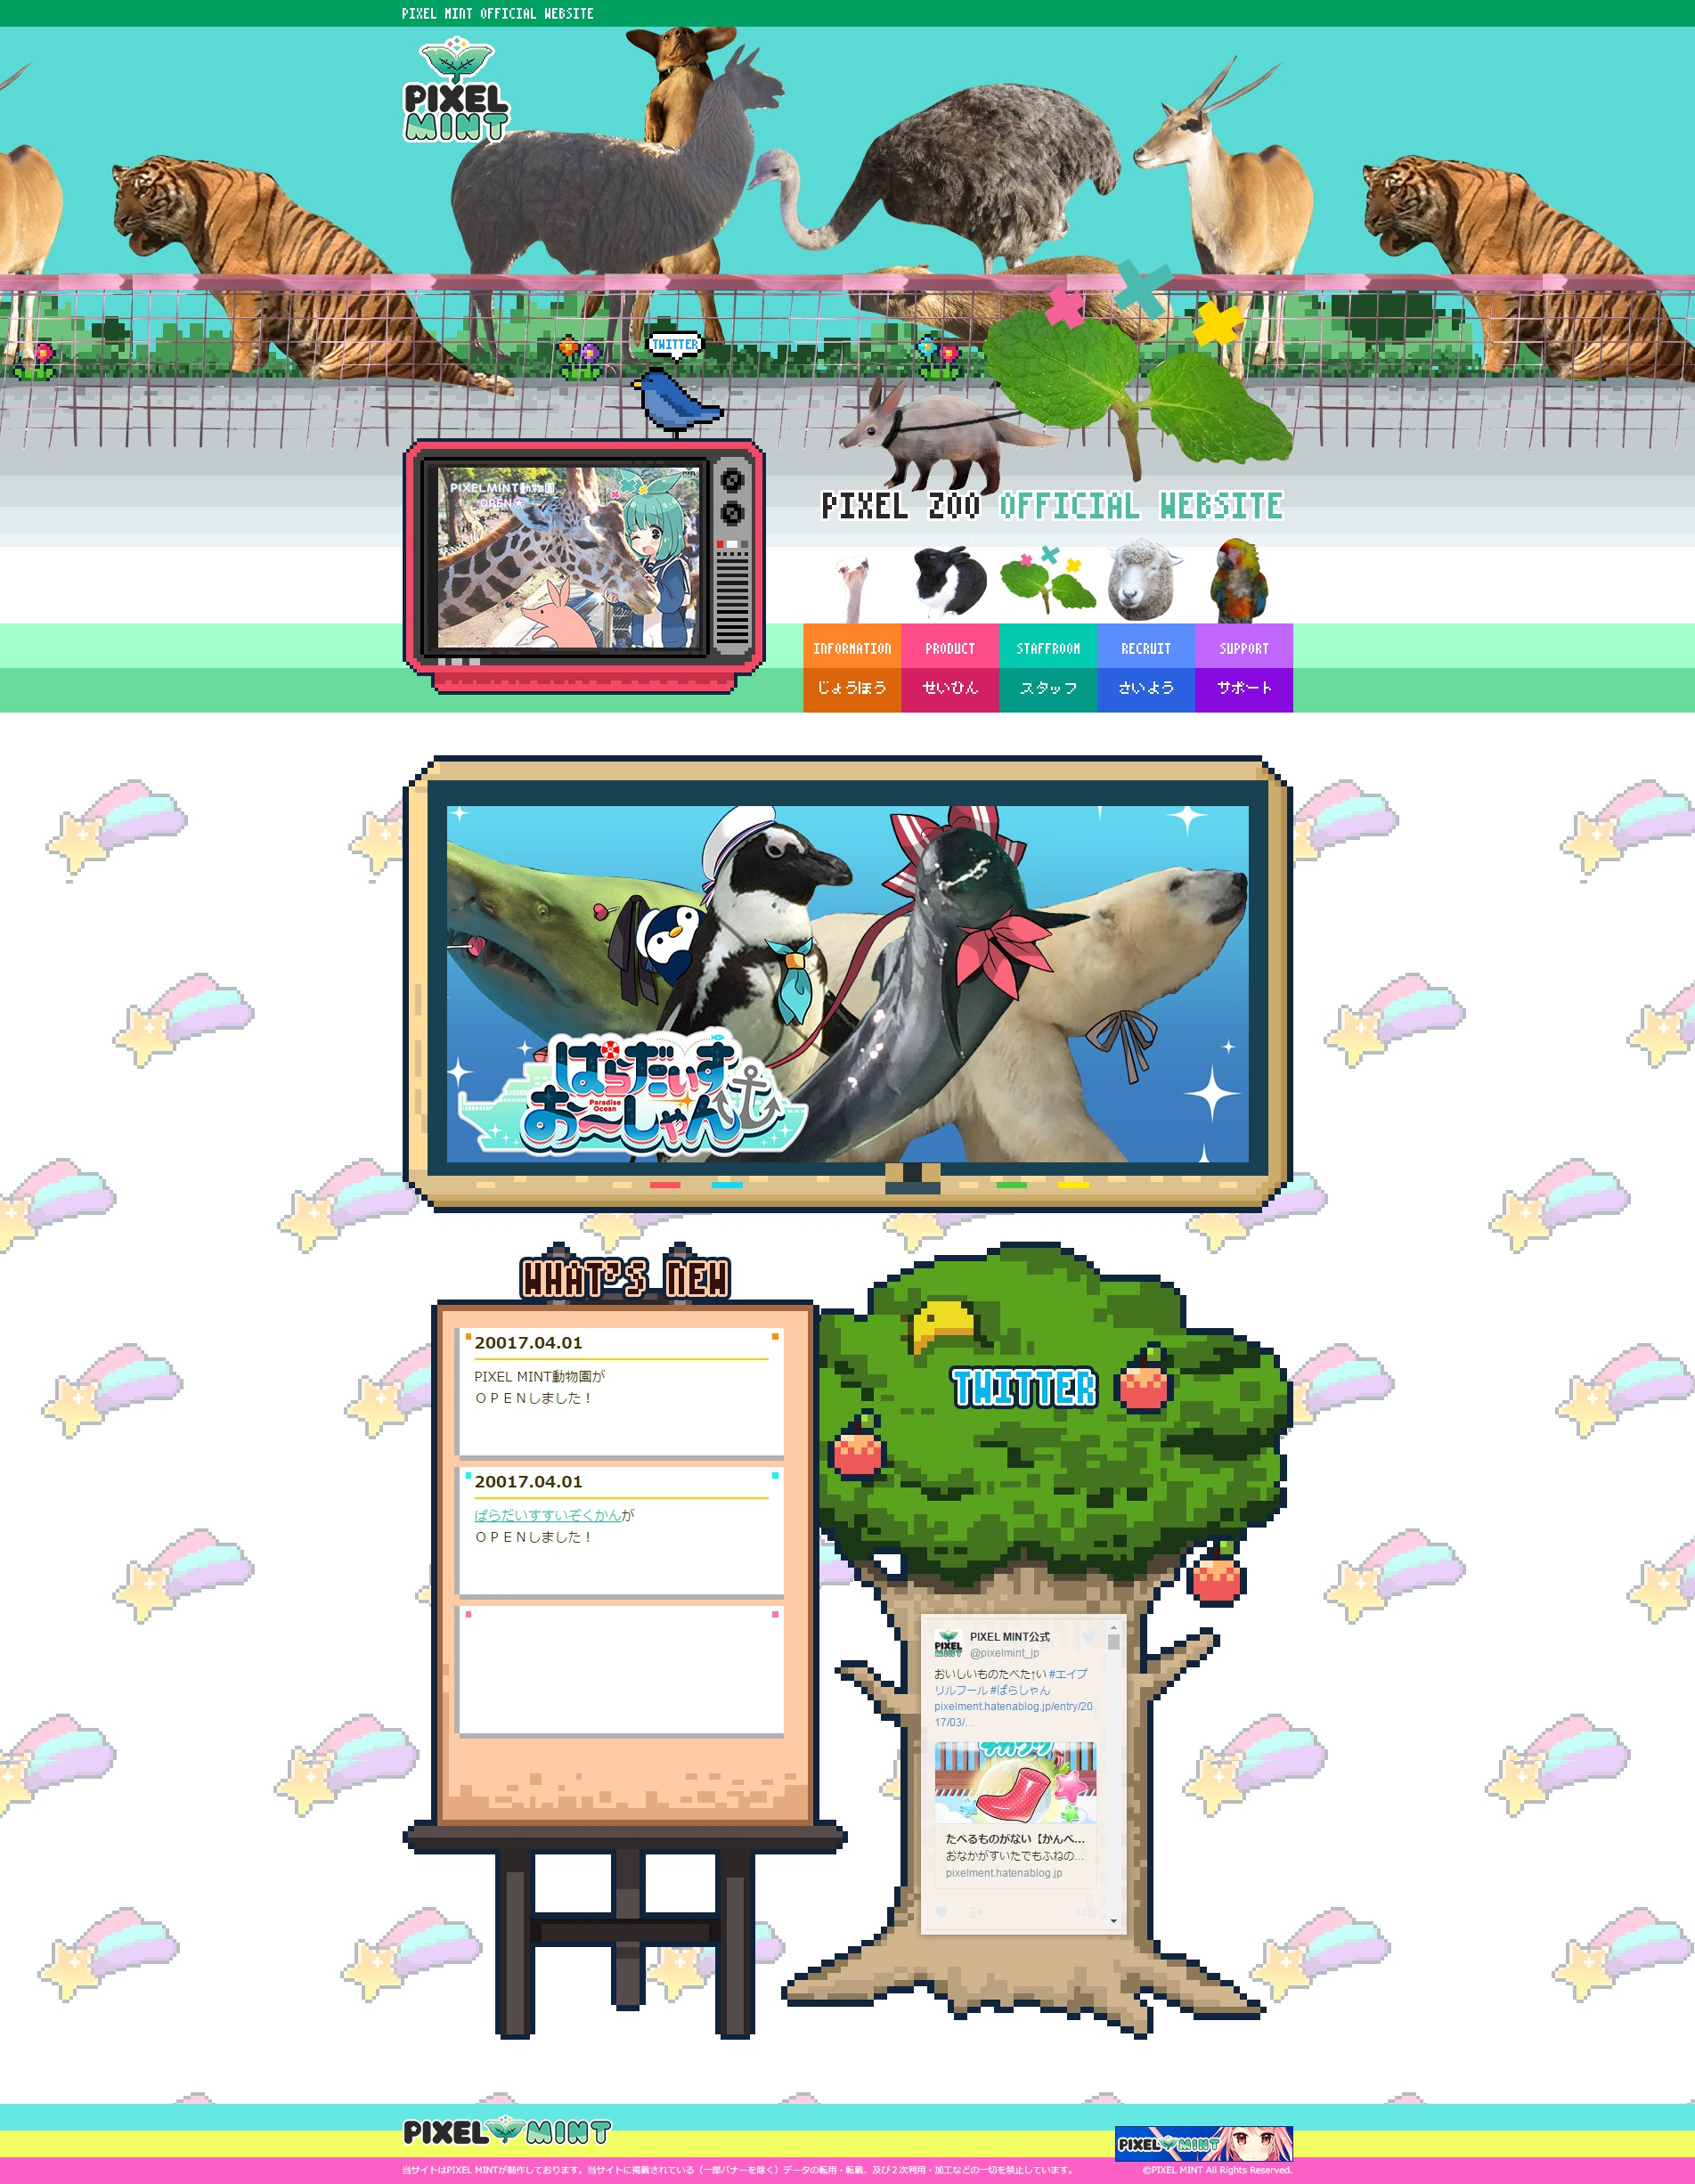 PIXEL MINT(ピクセルミント) Official Website